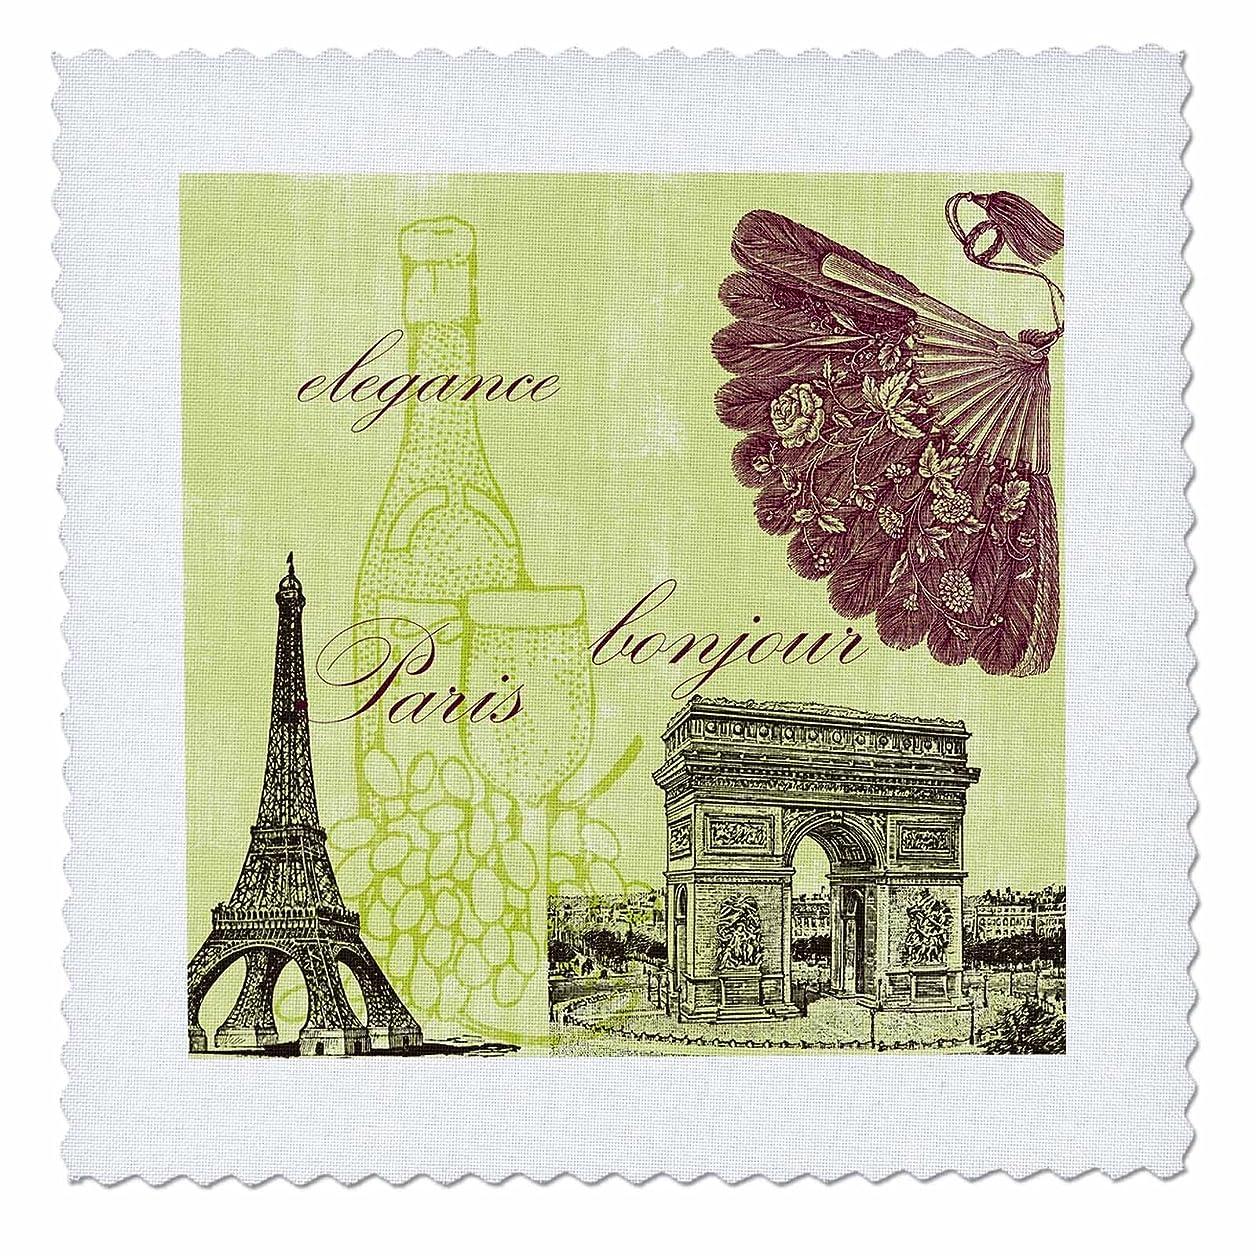 3dRose qs_79112_2 Paris Elegance Vintage Art Wine Eiffel Tower Quilt Square, 6 by 6-Inch jefgxipxgzbgflqa